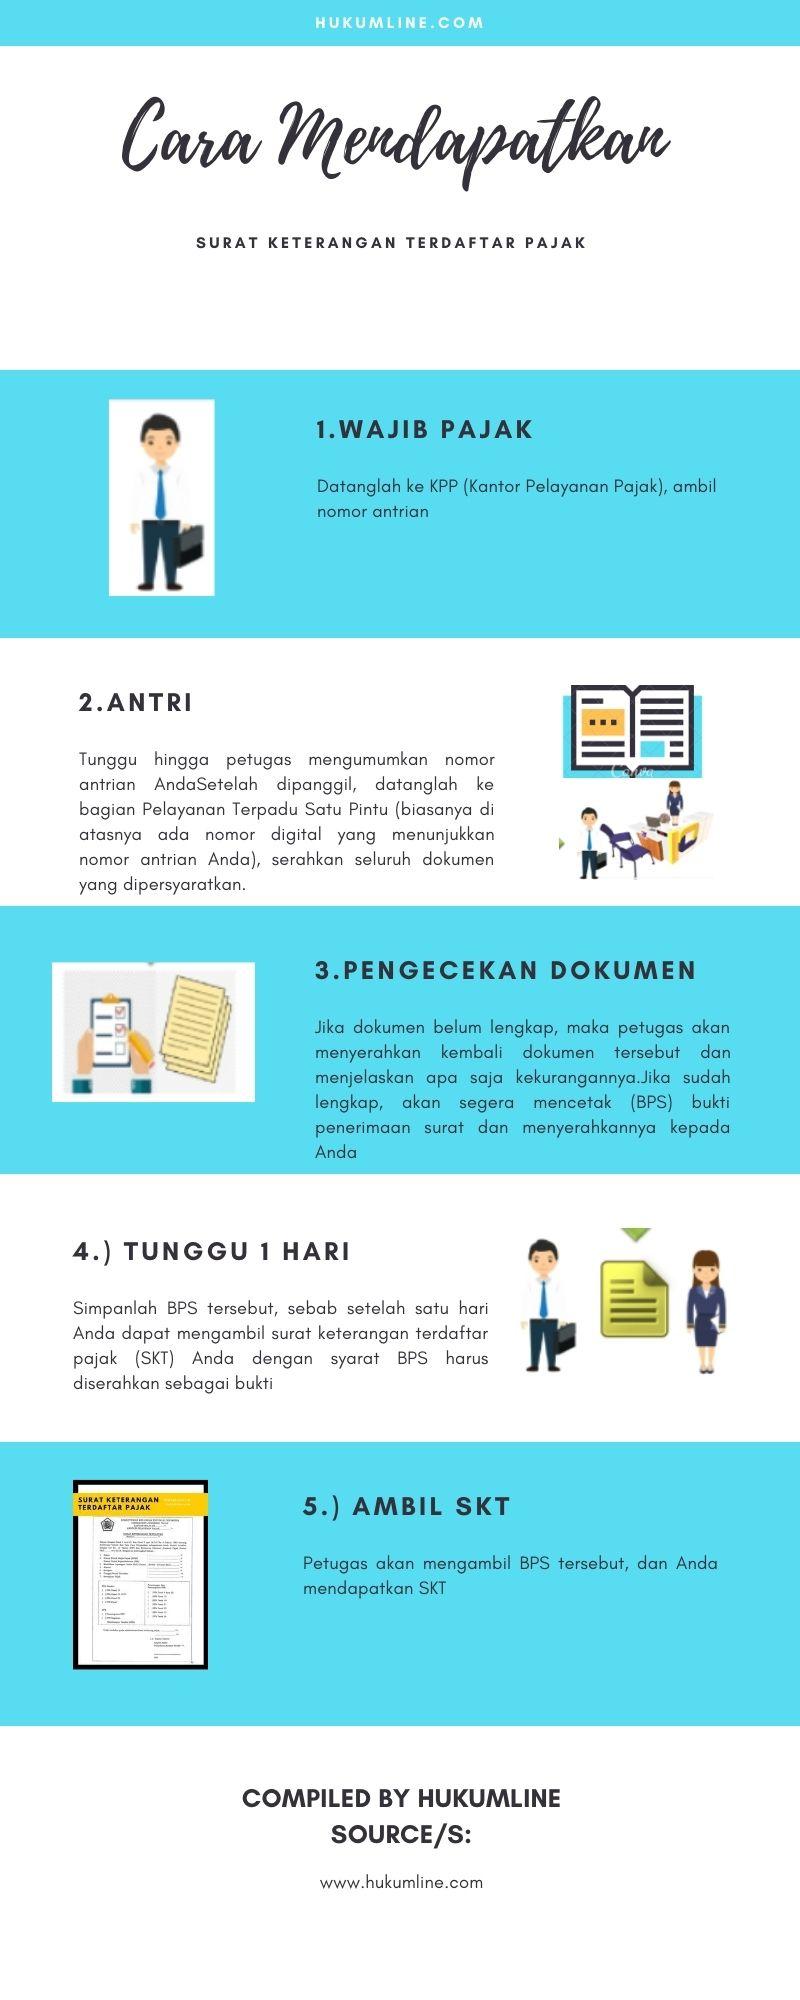 Cara Mendapatkan Surat Keterangan Terdaftar Pajak